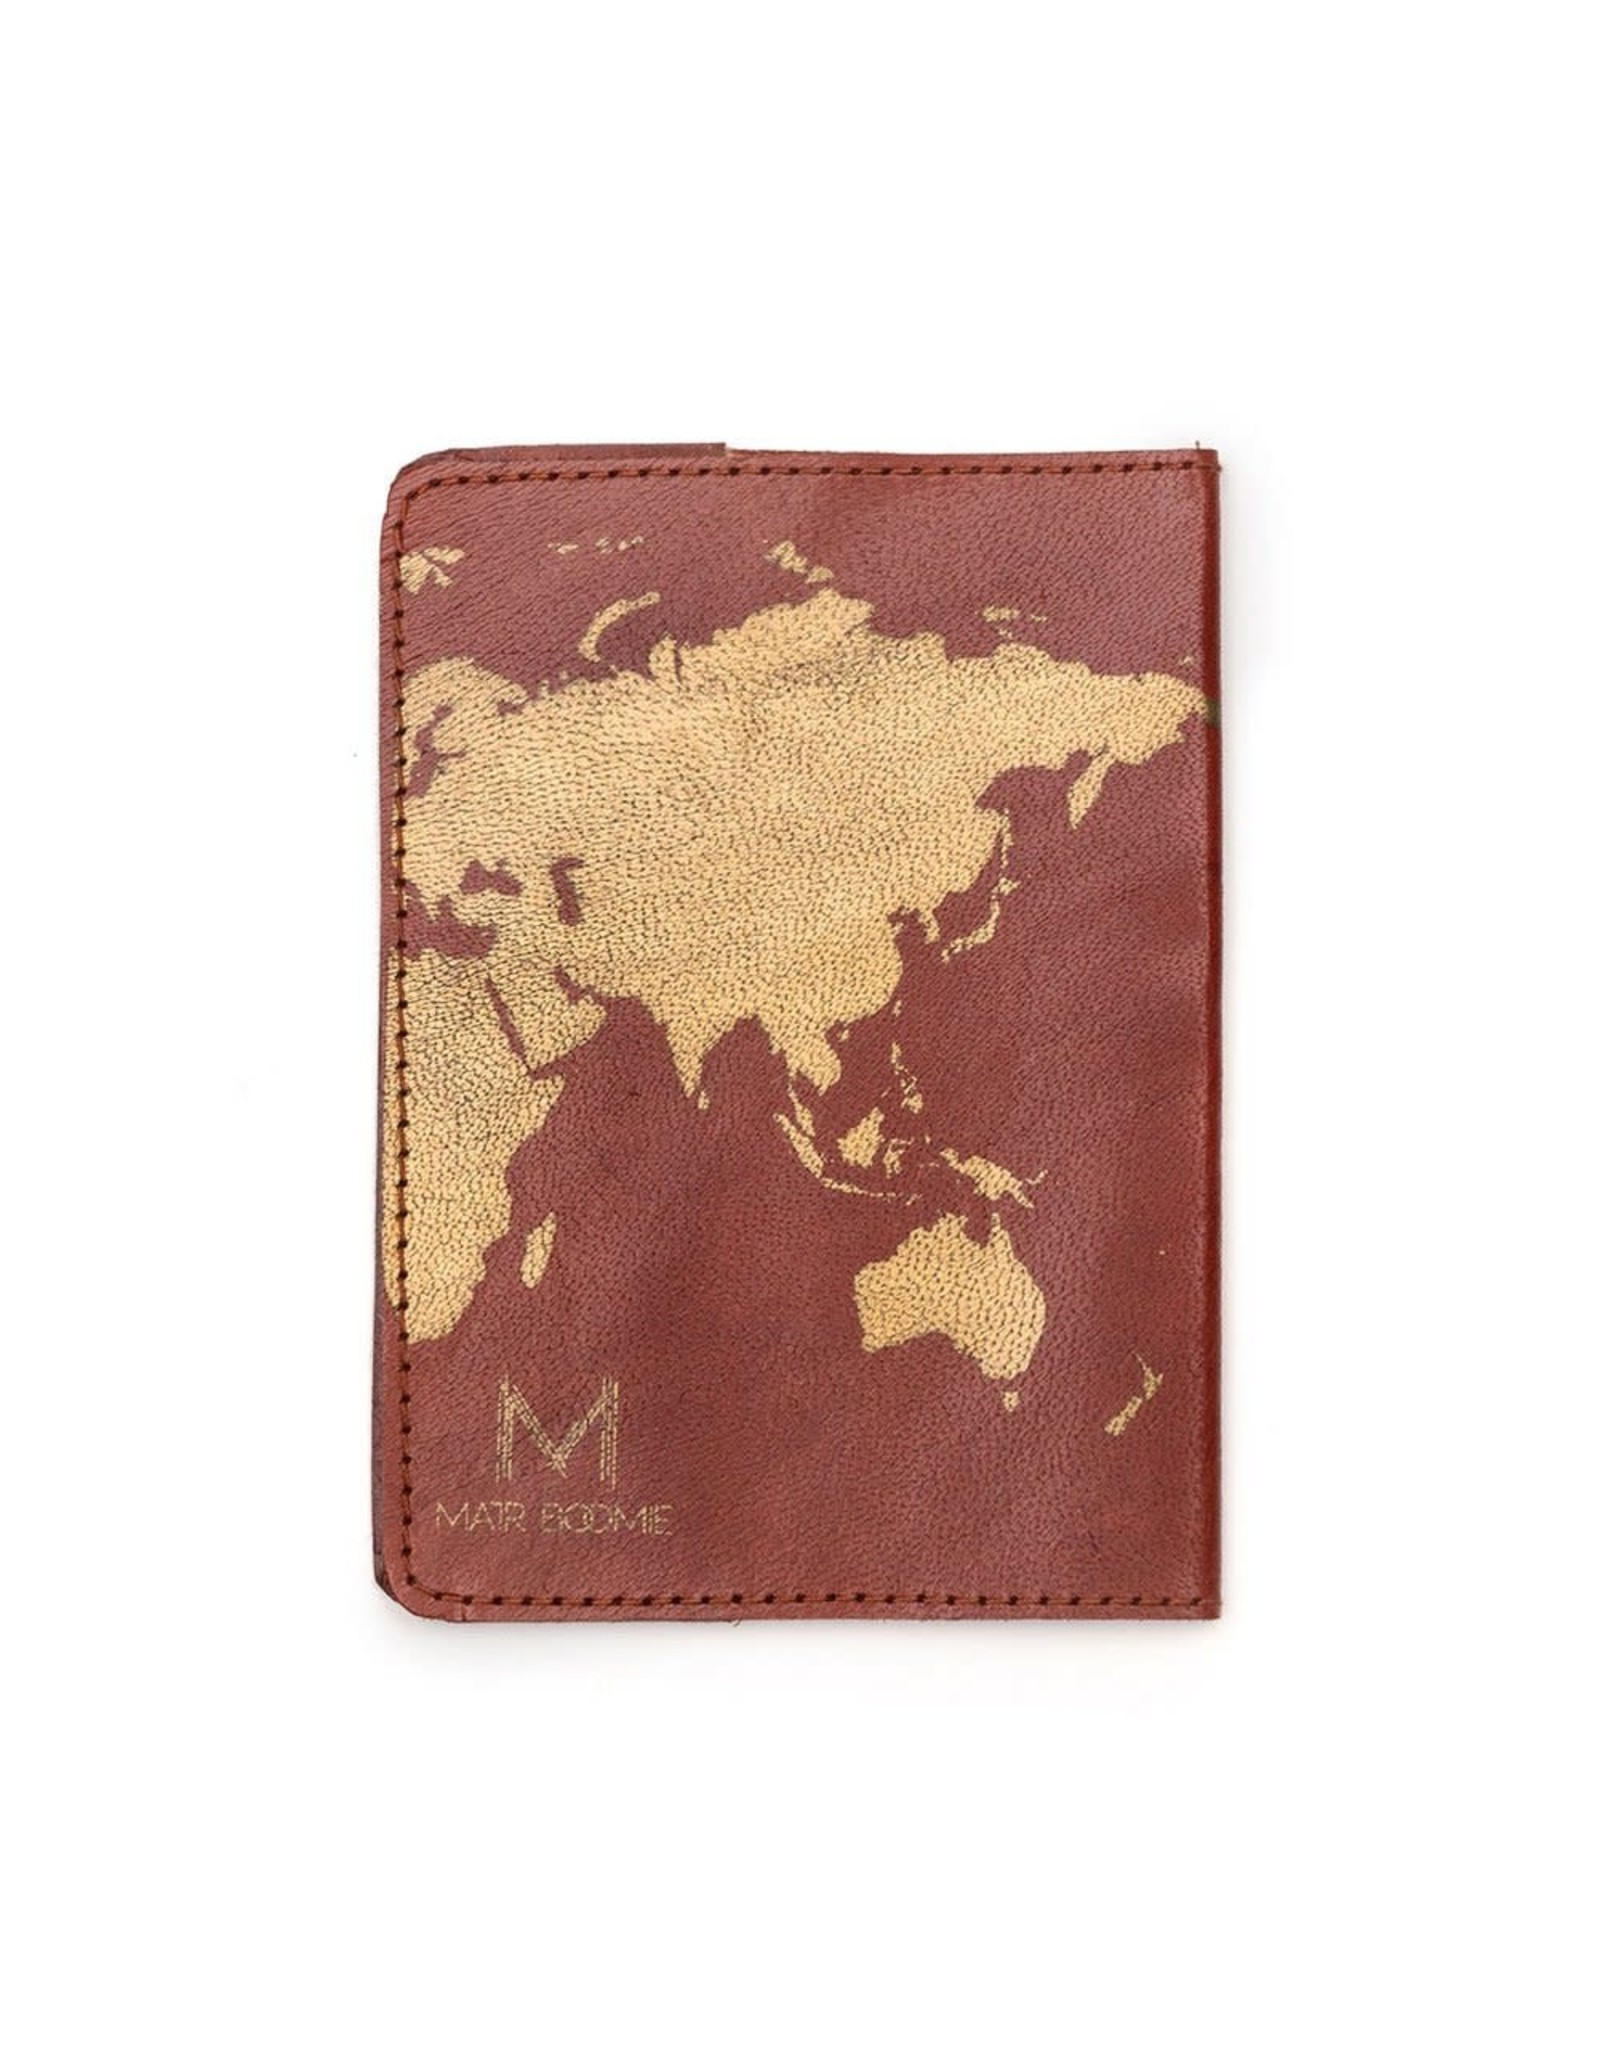 Globetrotter Passport Cover